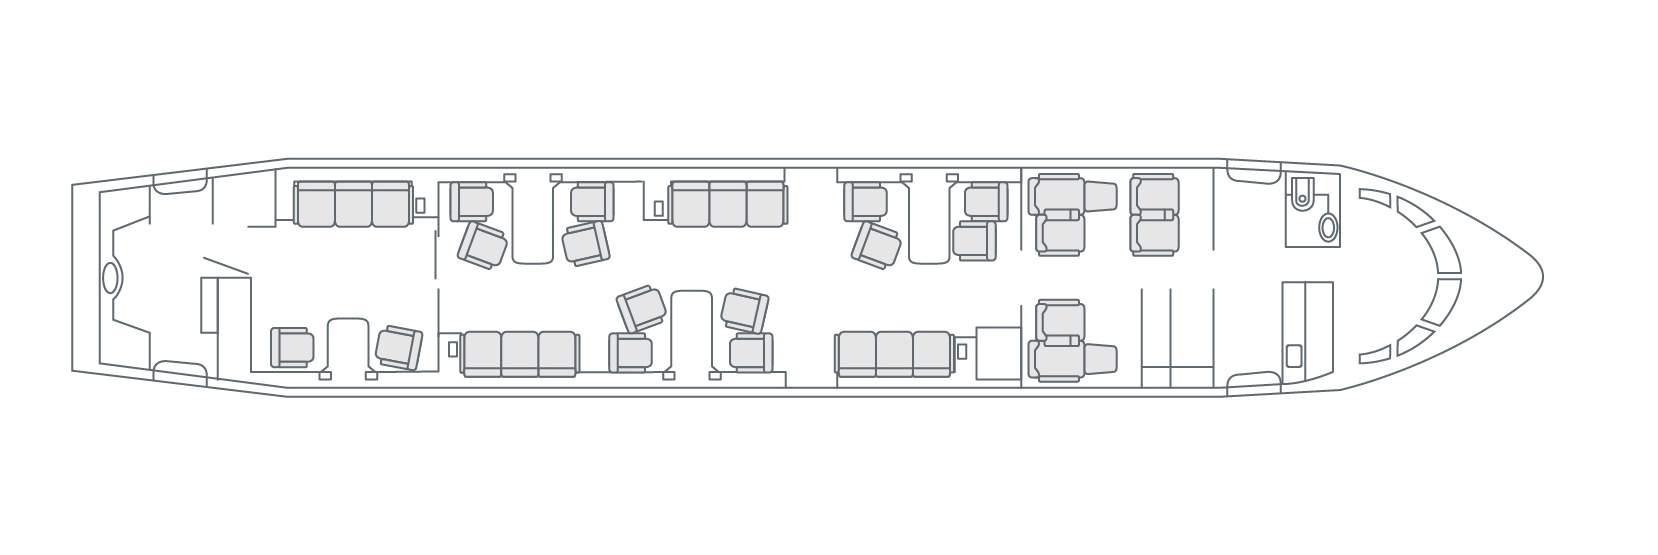 Mapa Asiento_Airbus 318 Elite.jpg